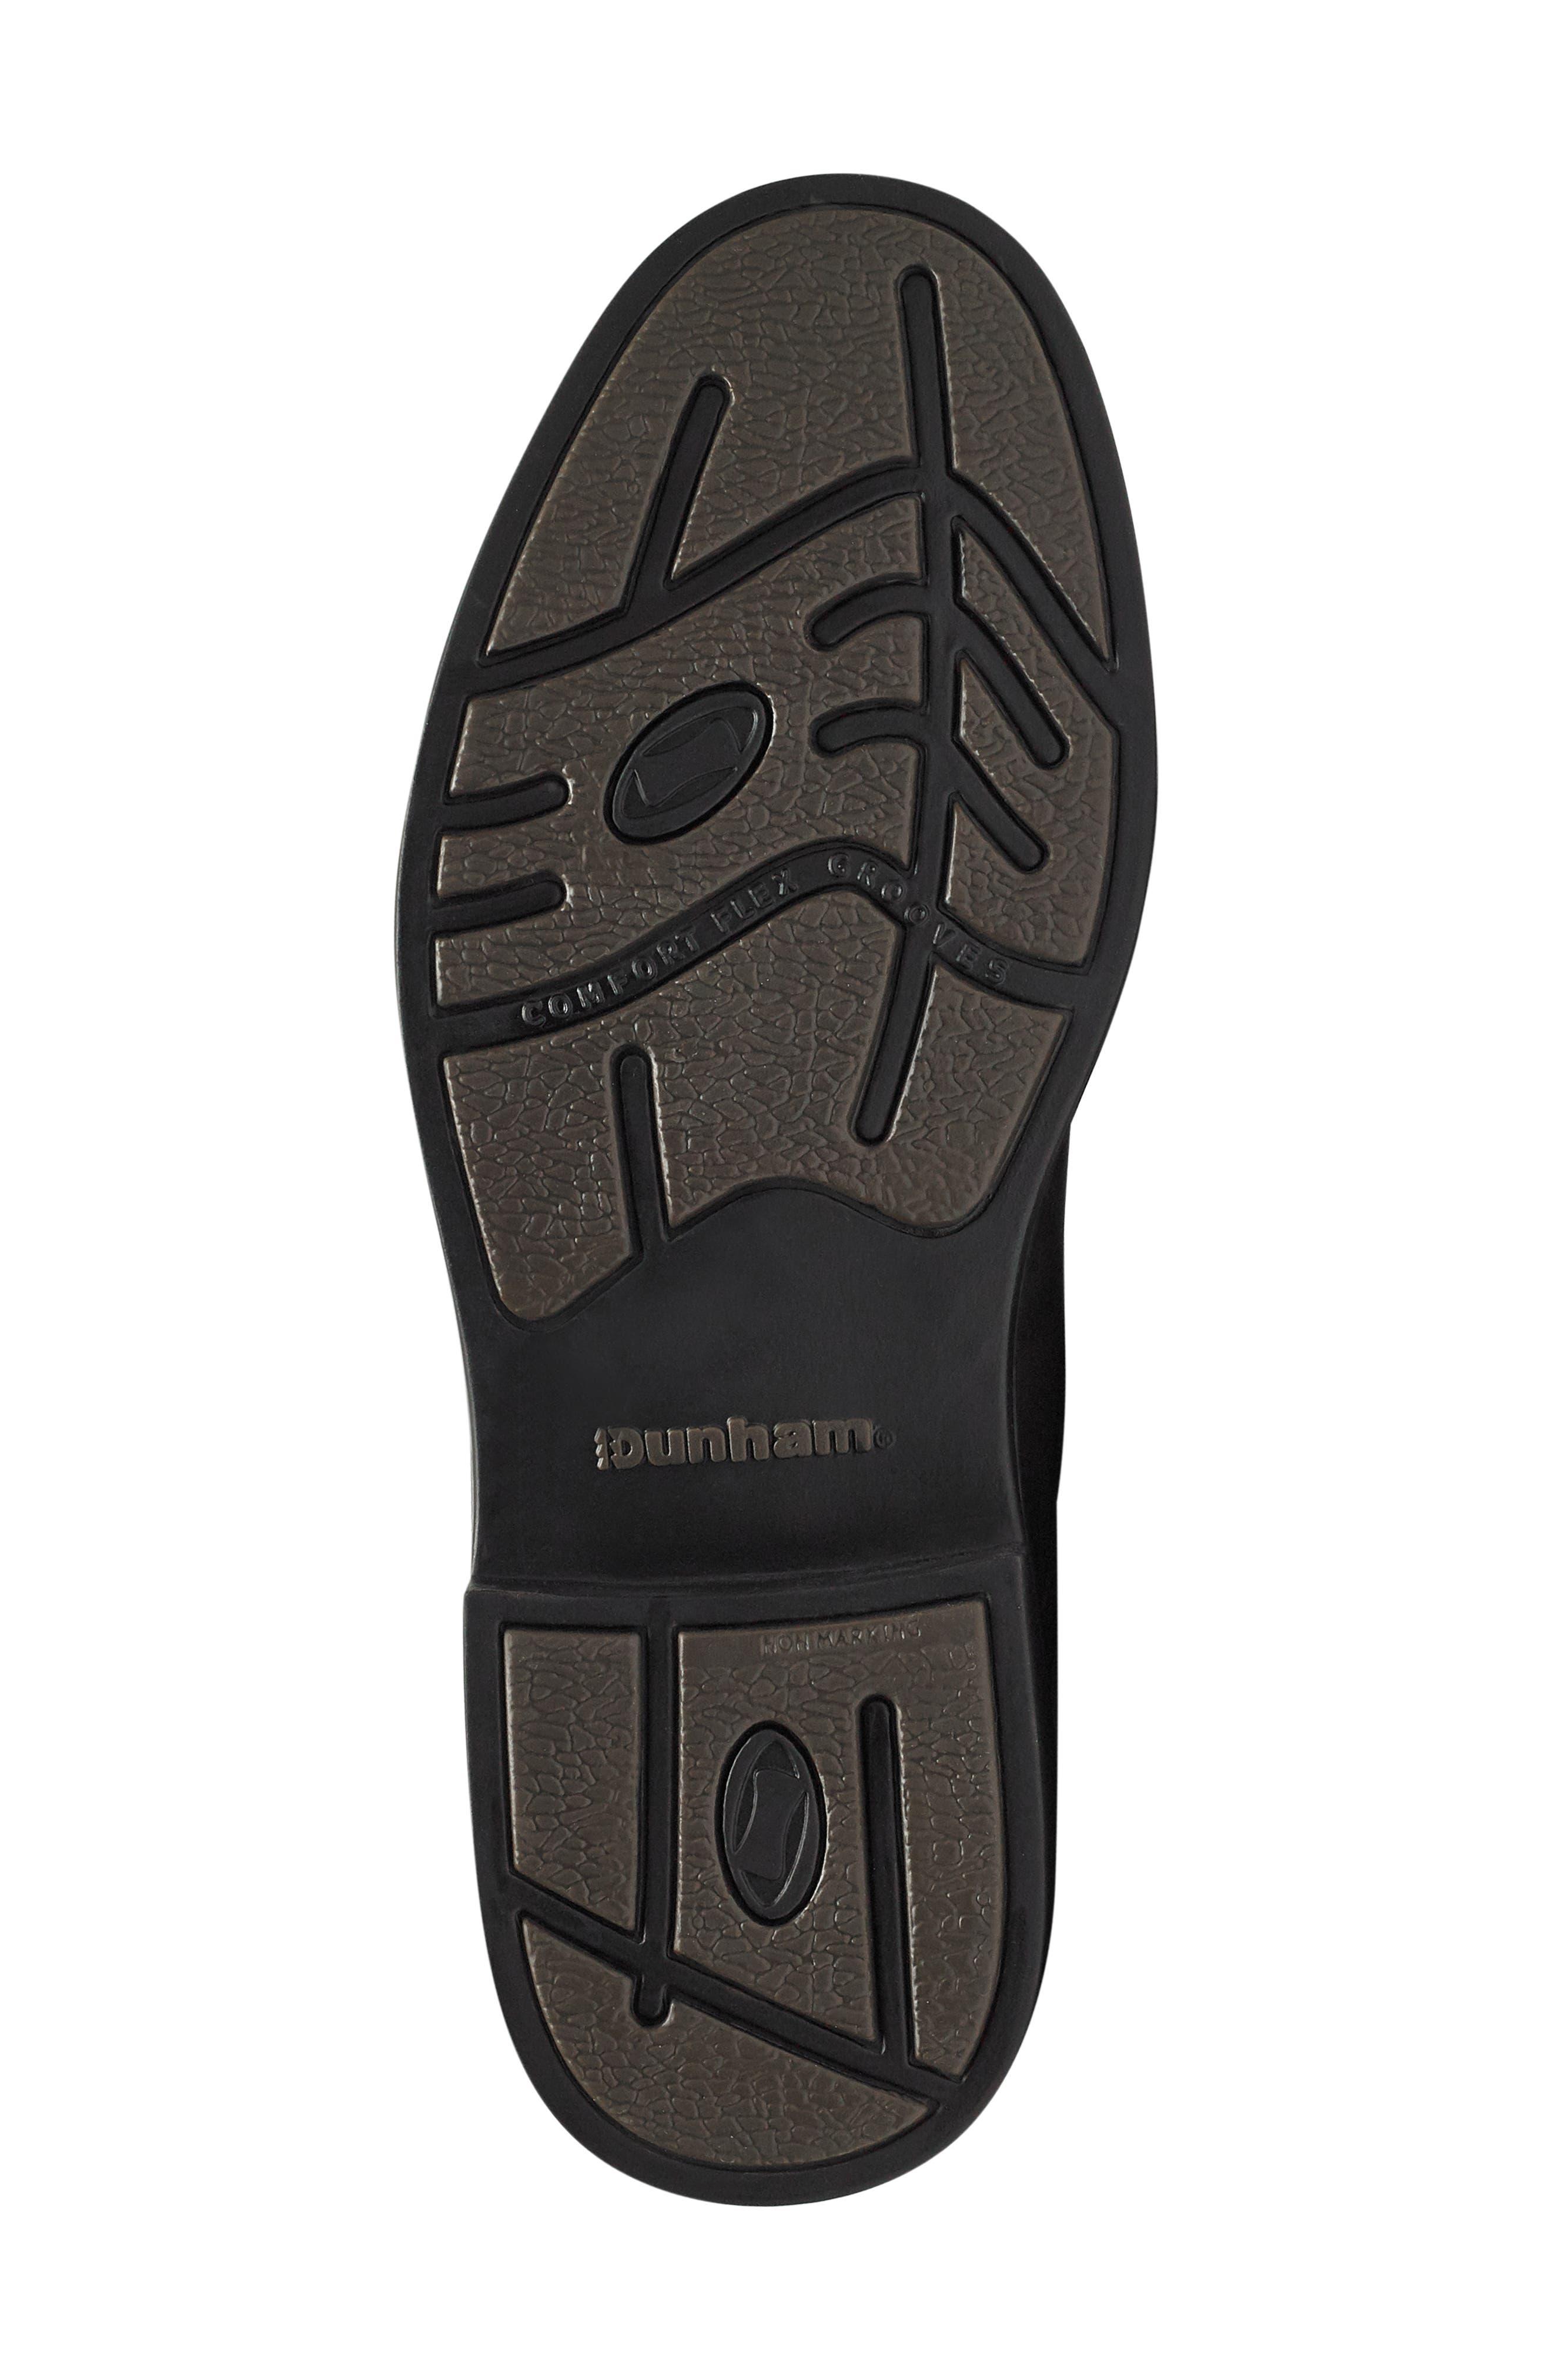 DUNHAM, Jericho Waterproof Chukka Boot, Alternate thumbnail 6, color, 020